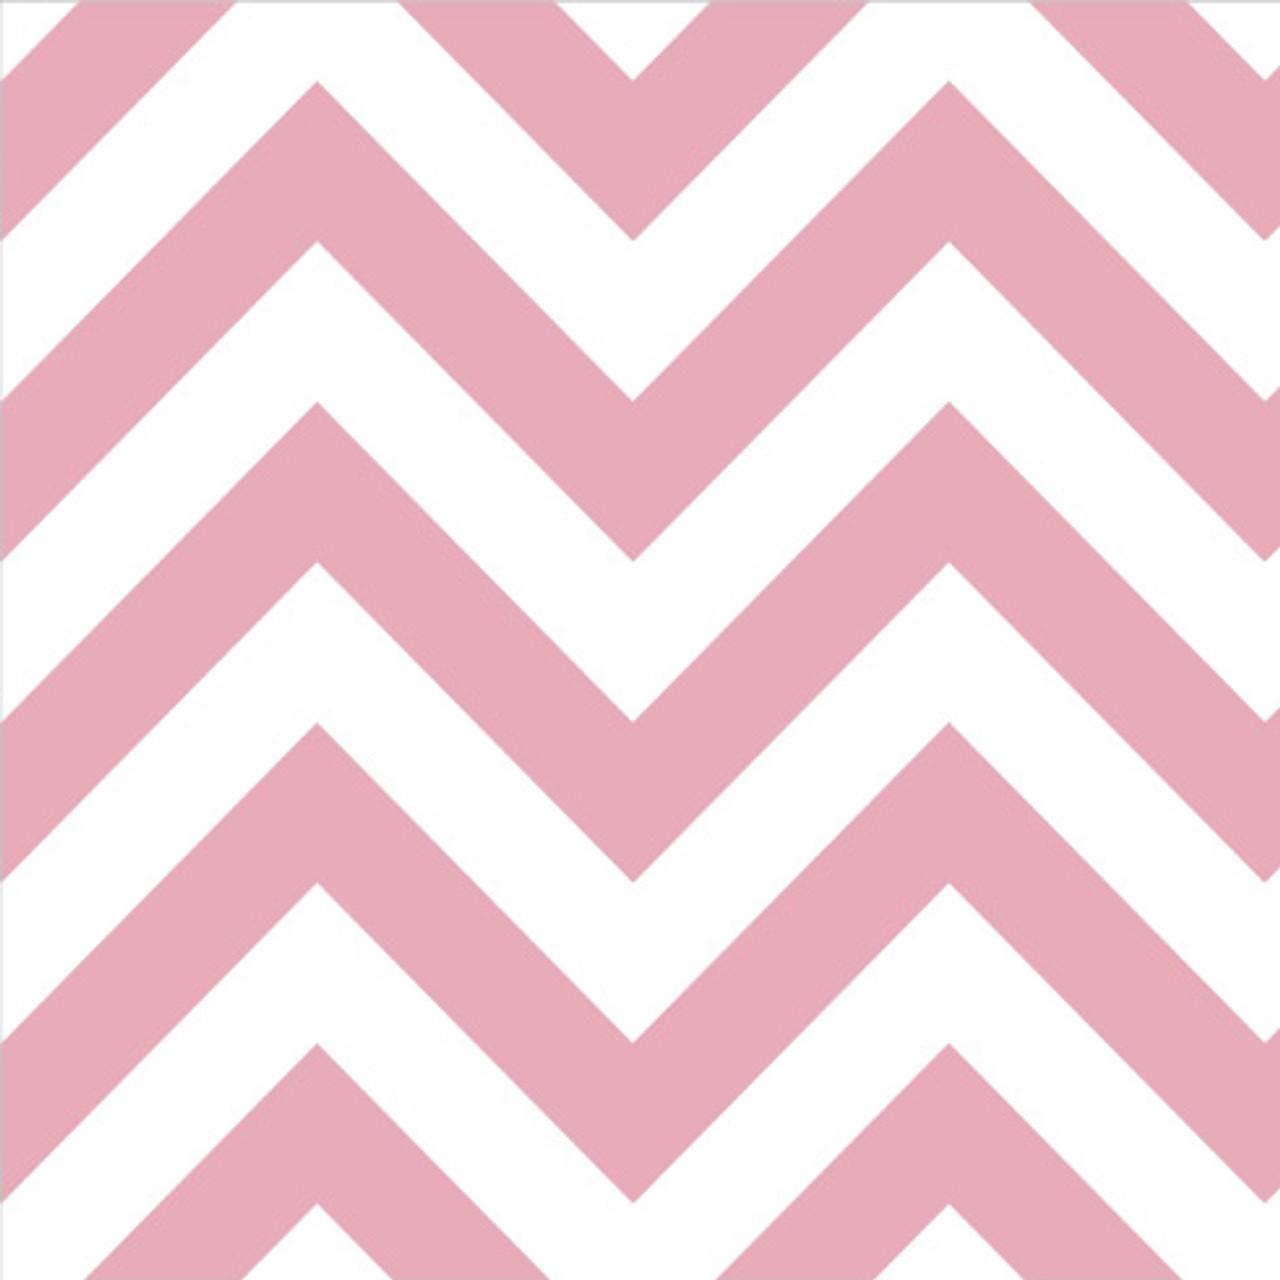 Pink Chevron Napkins